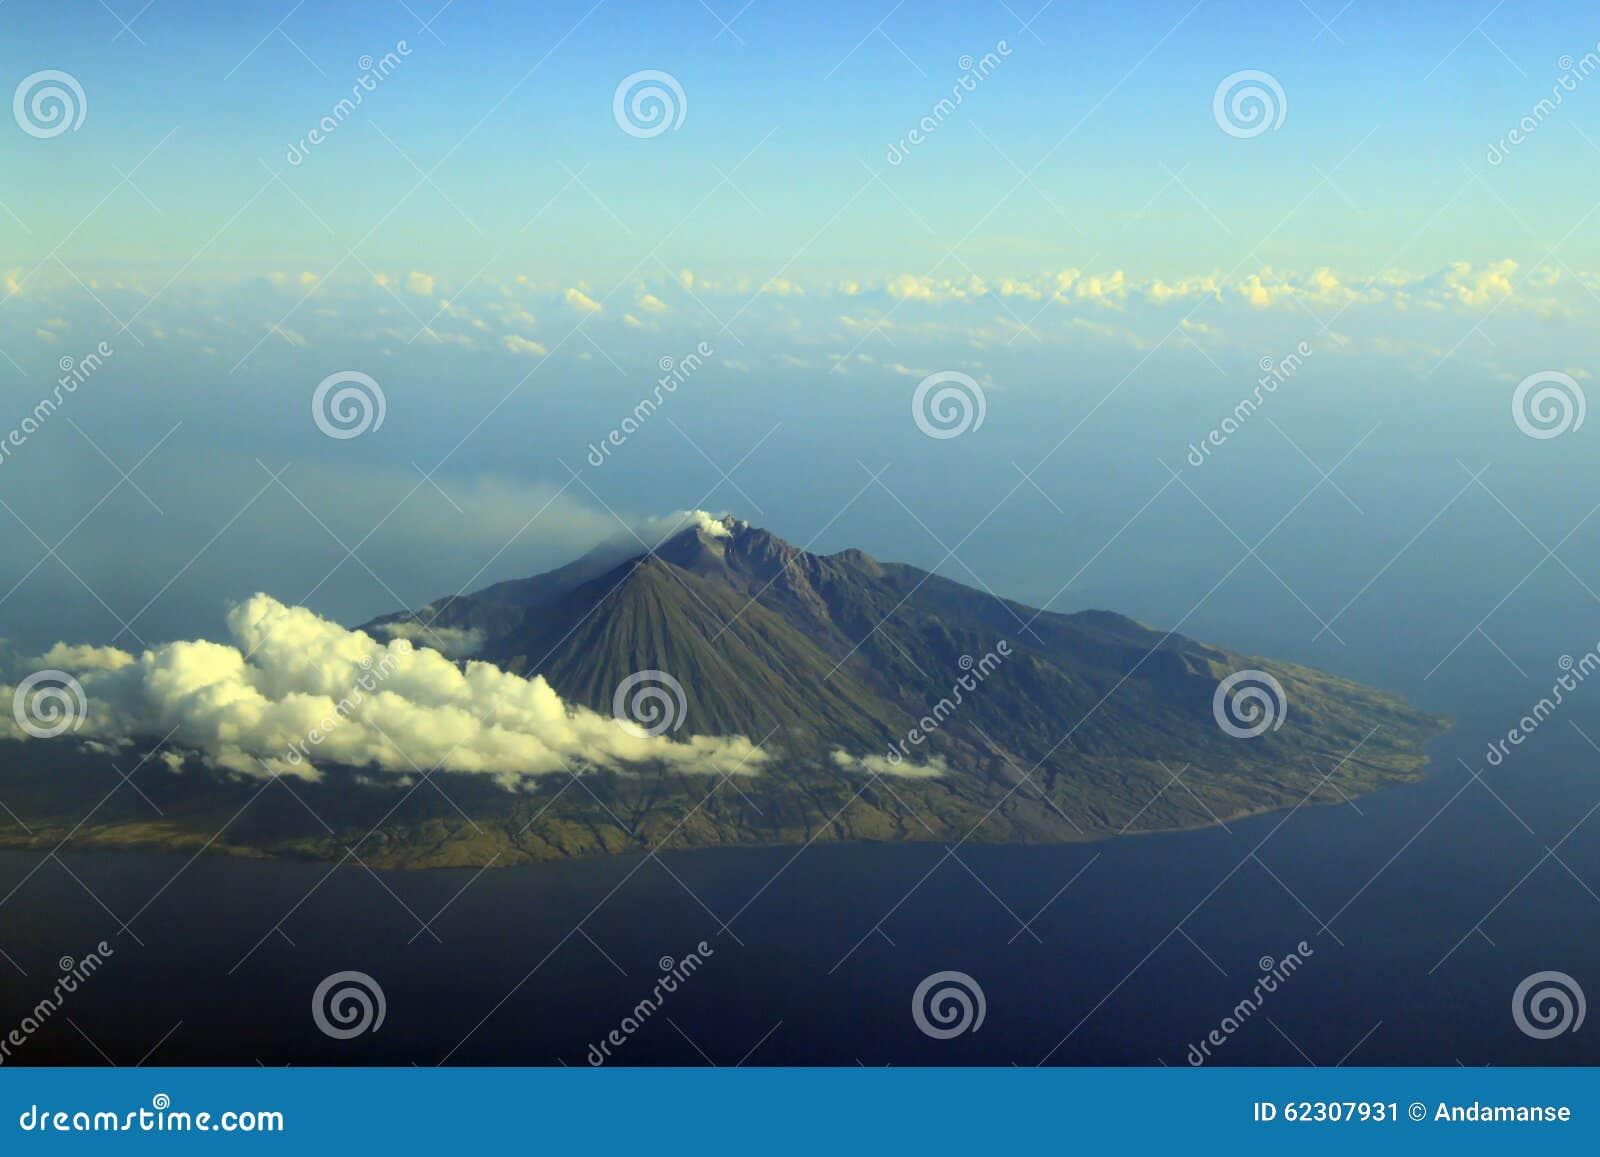 Vulcano Fuming